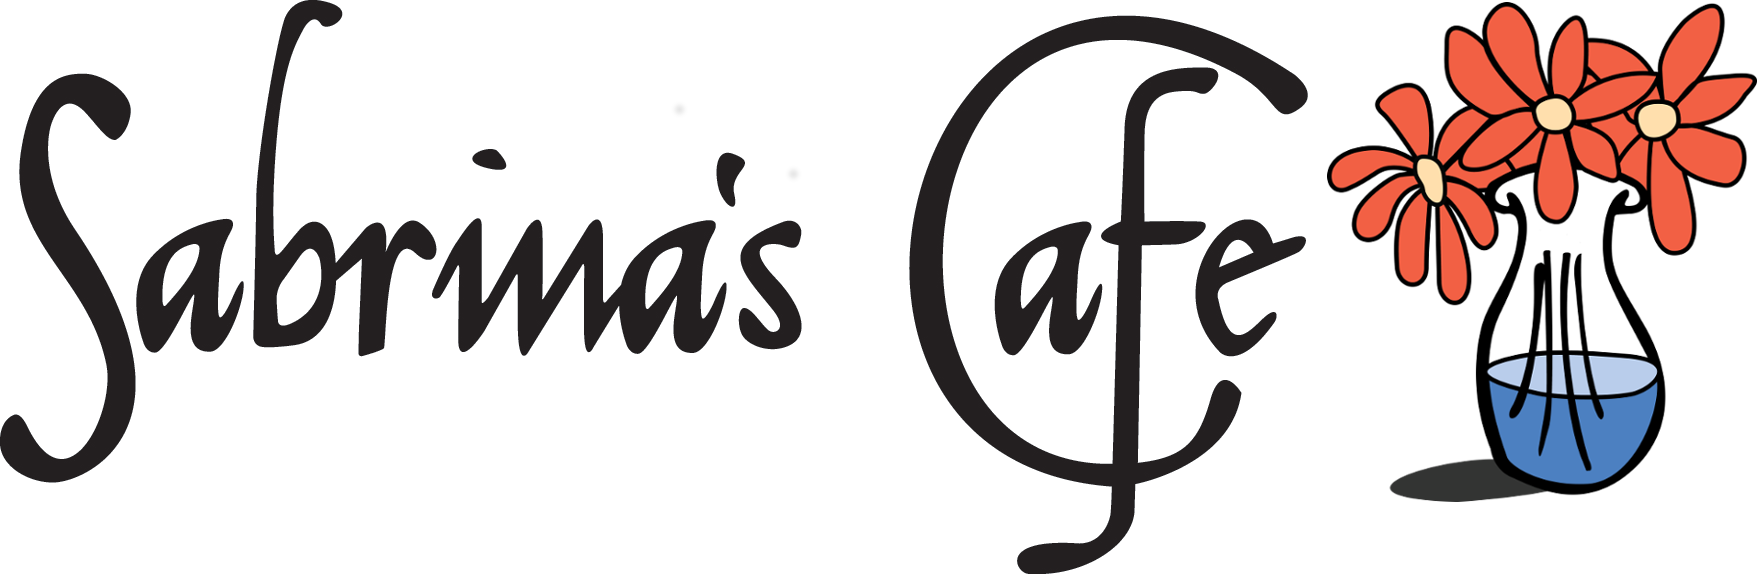 Sabrina's Cafe Home